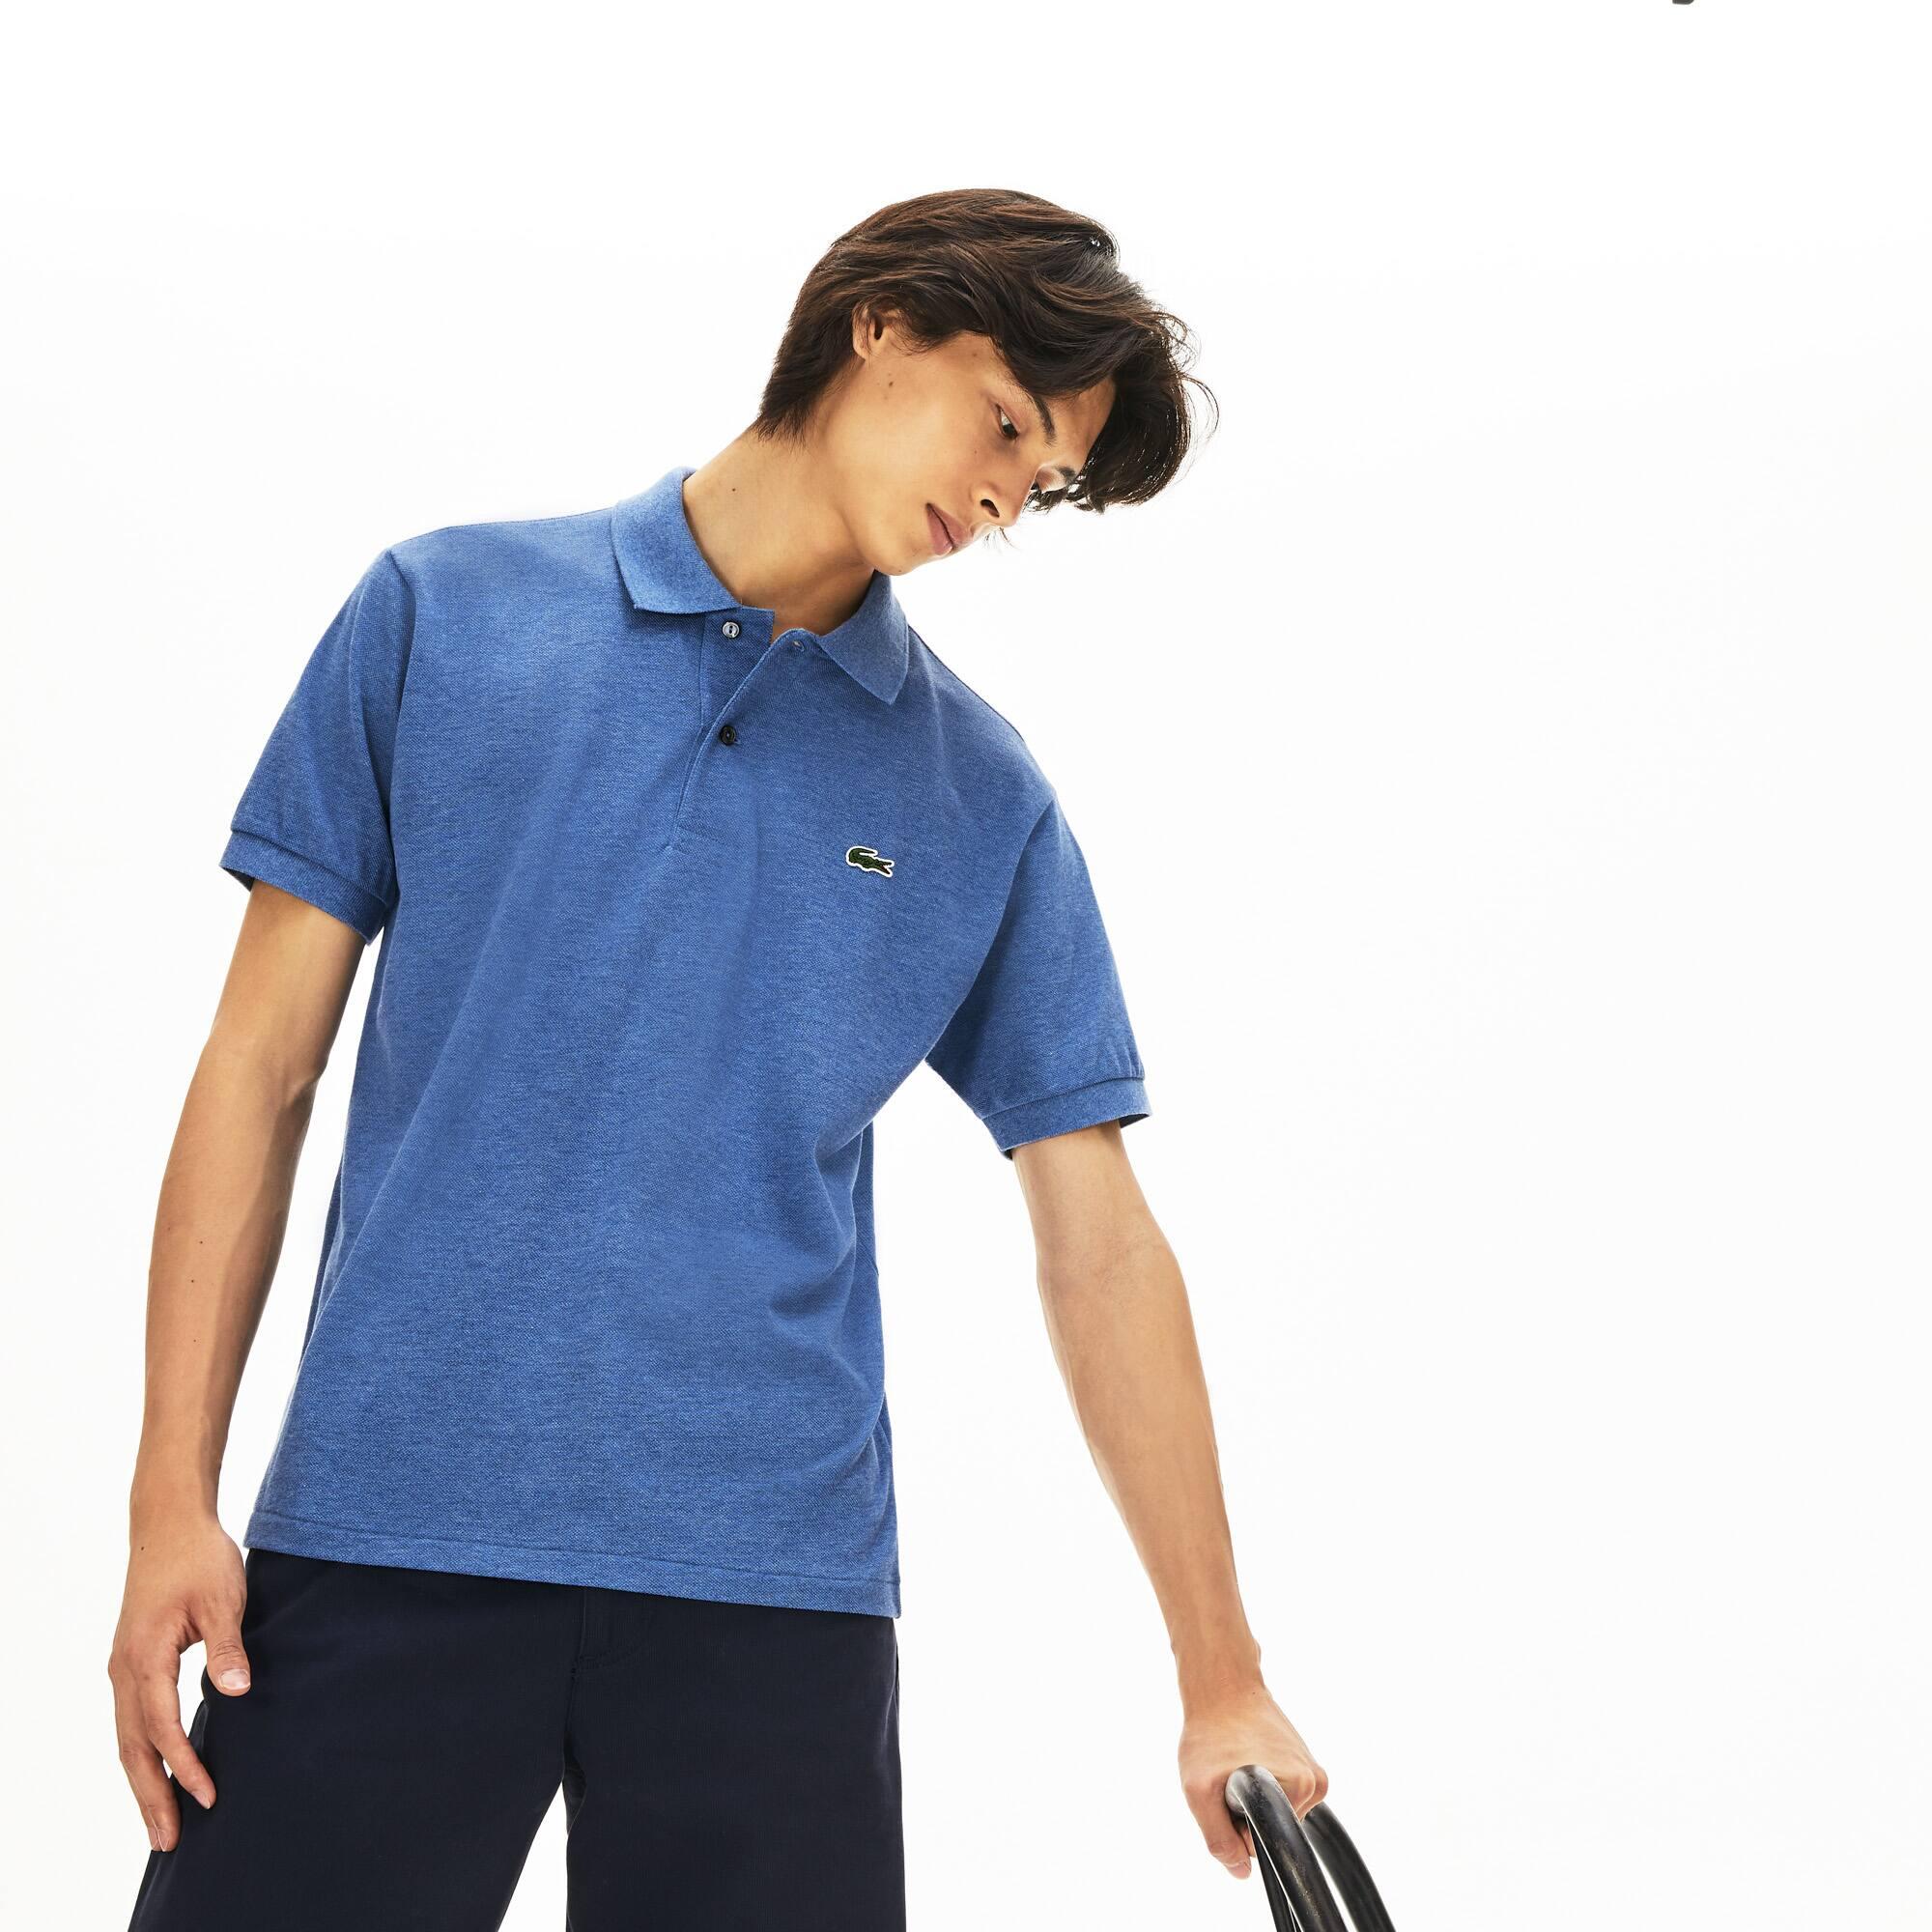 Lacoste Men/'s New L.12.12 Short Sleeve Cotton Pique Polo Shirt Green